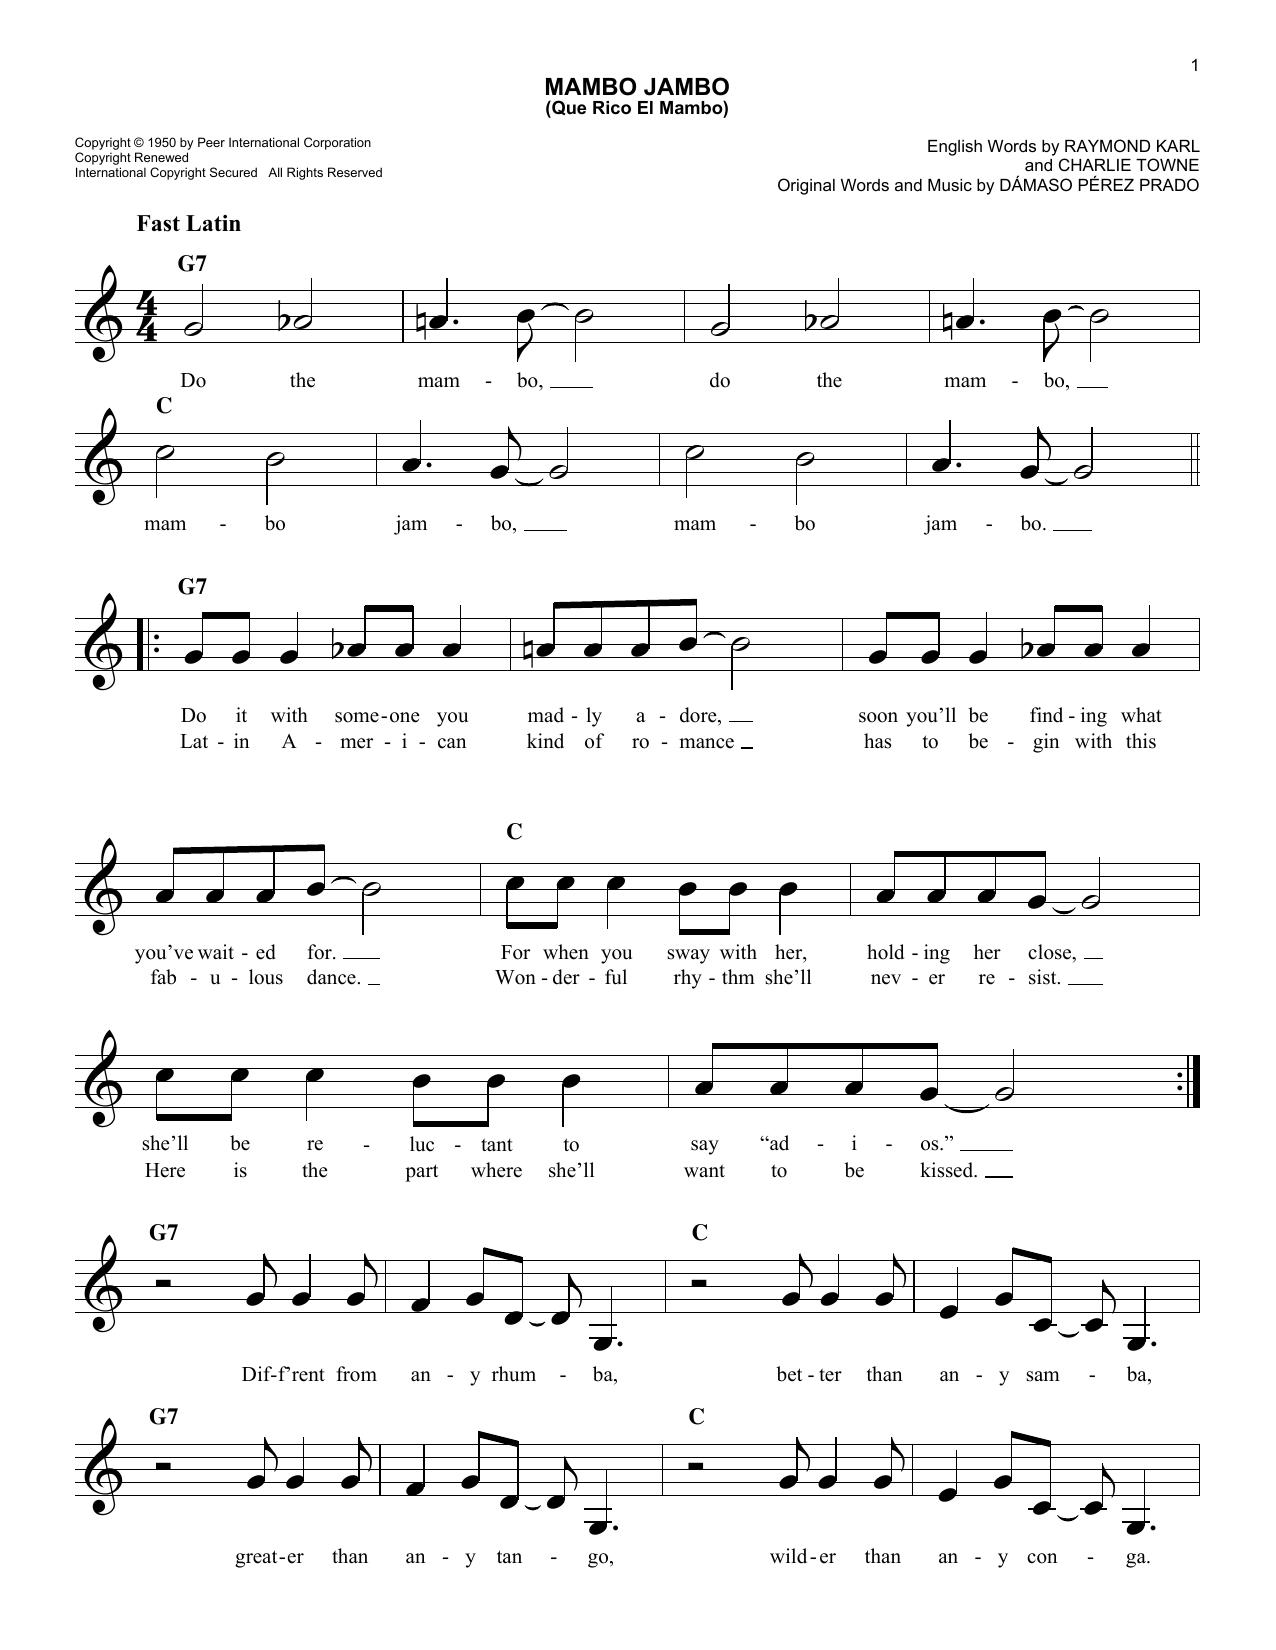 Mambo Jambo (Que Rico El Mambo) Sheet Music